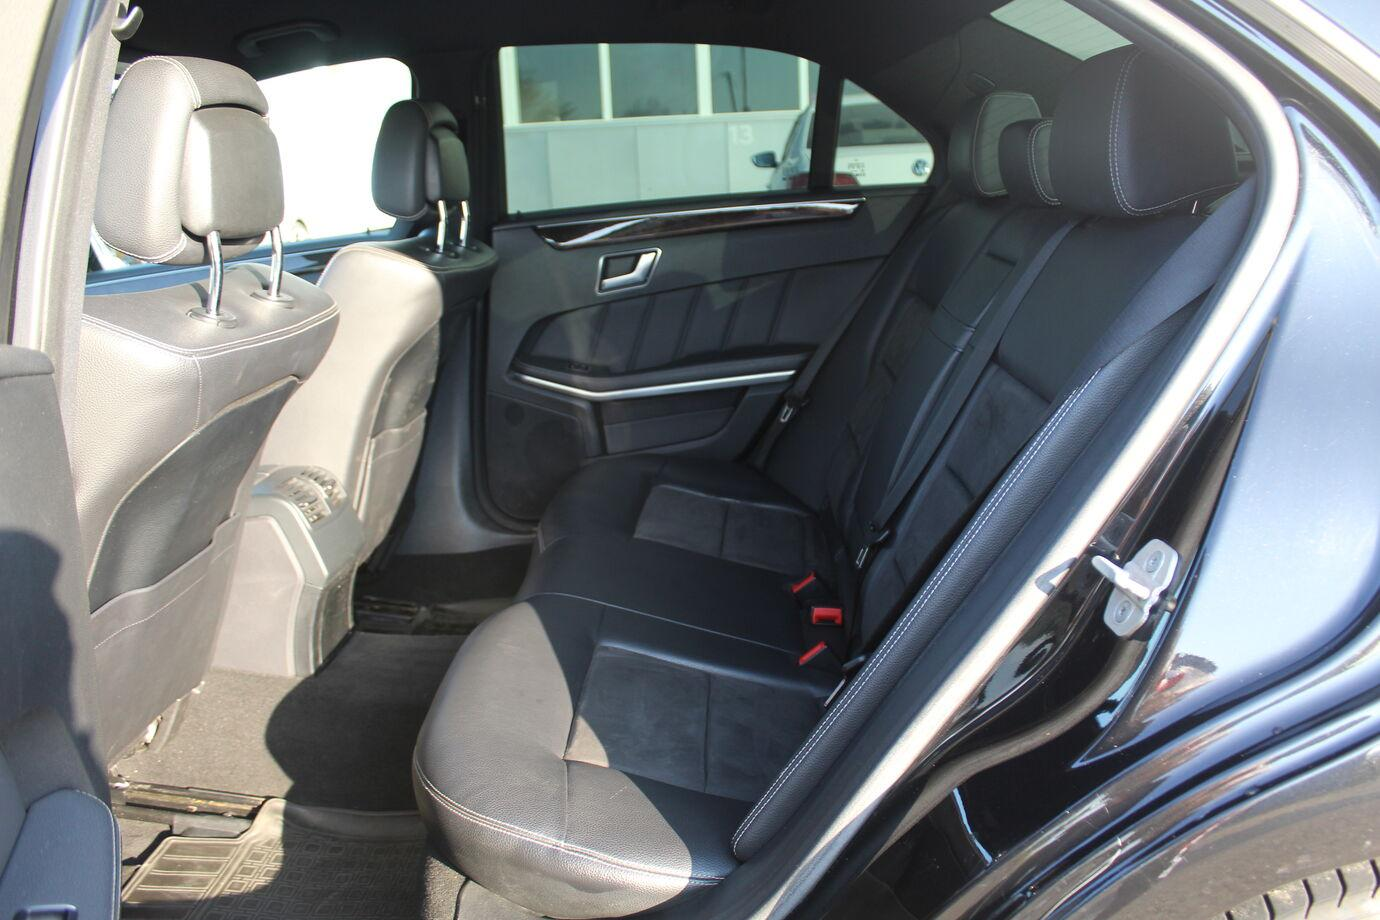 Mercedes-Benz E-Класс, IV (W212, S212, C207) 2013г.